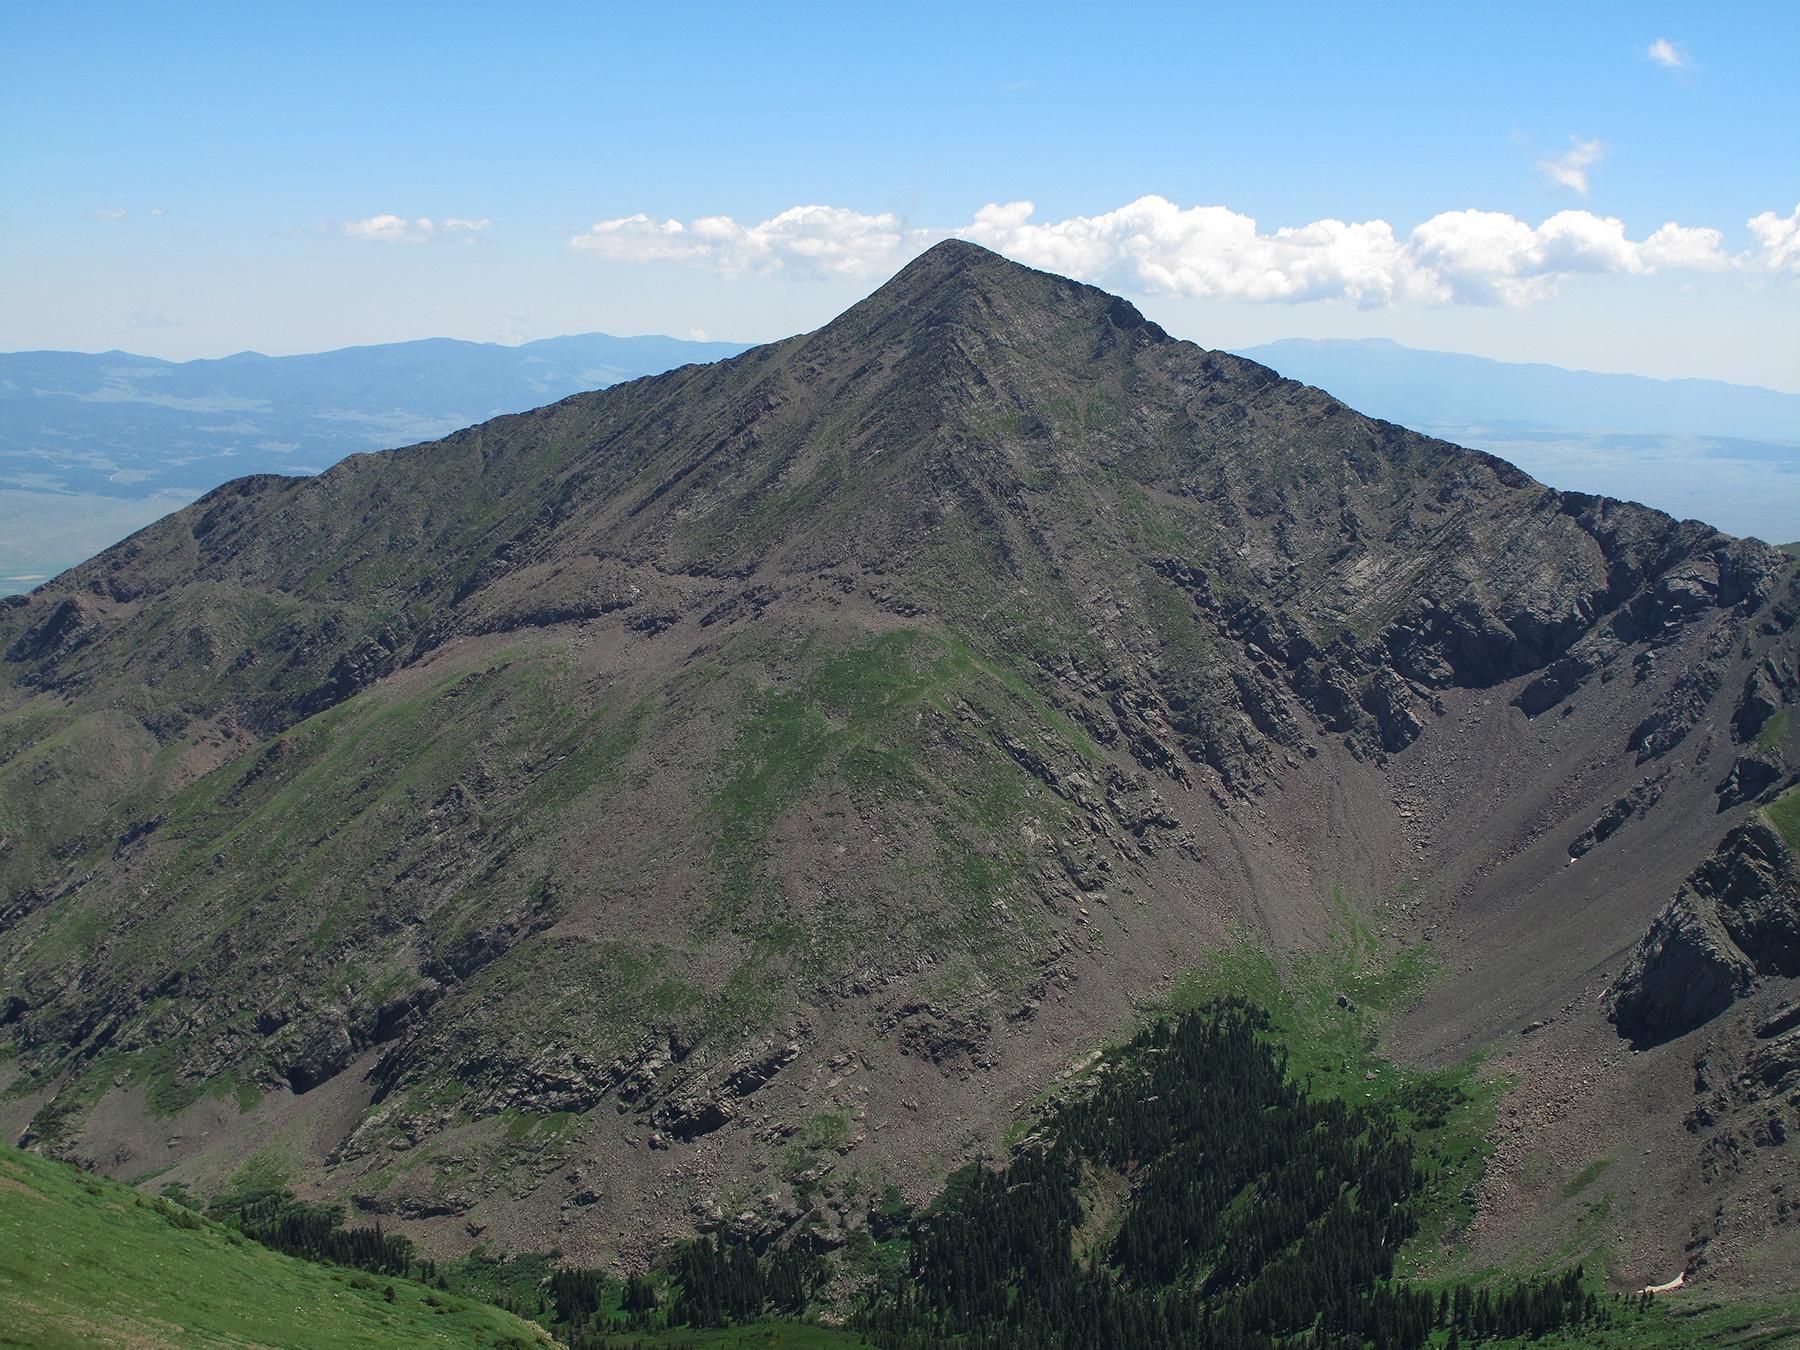 Horn Peak - 13,450